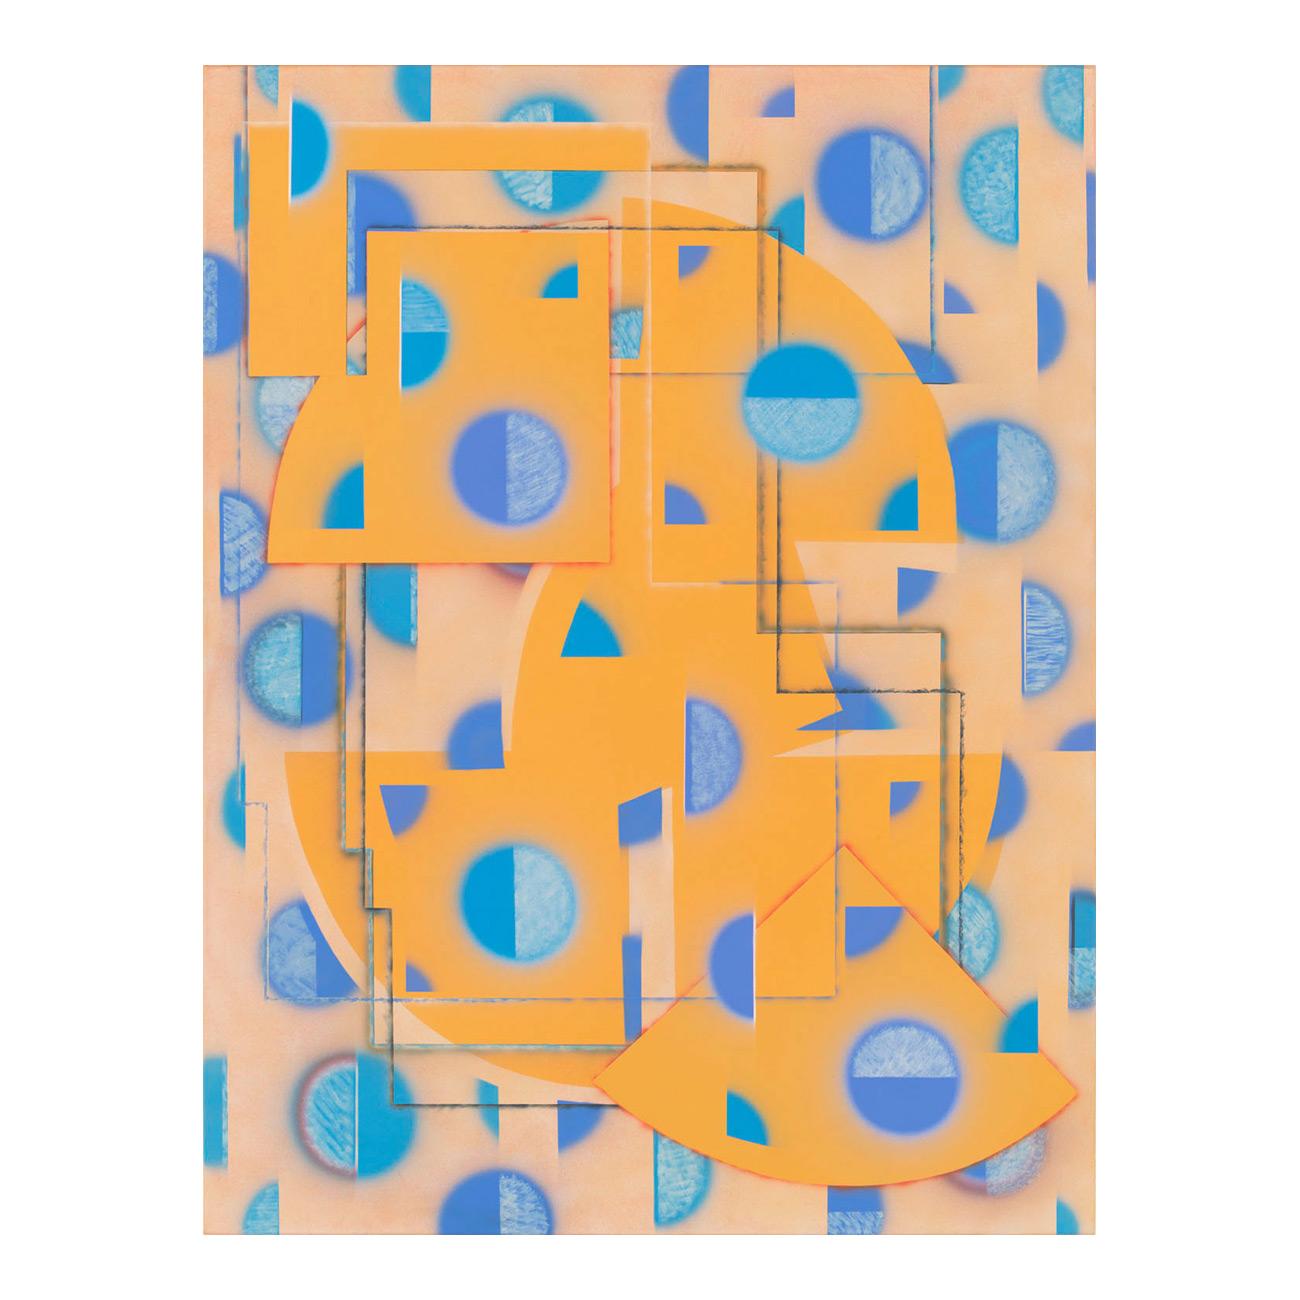 Bild gelbblau . 2011 . 145 x 110 cm . Acryl auf Baumwolle